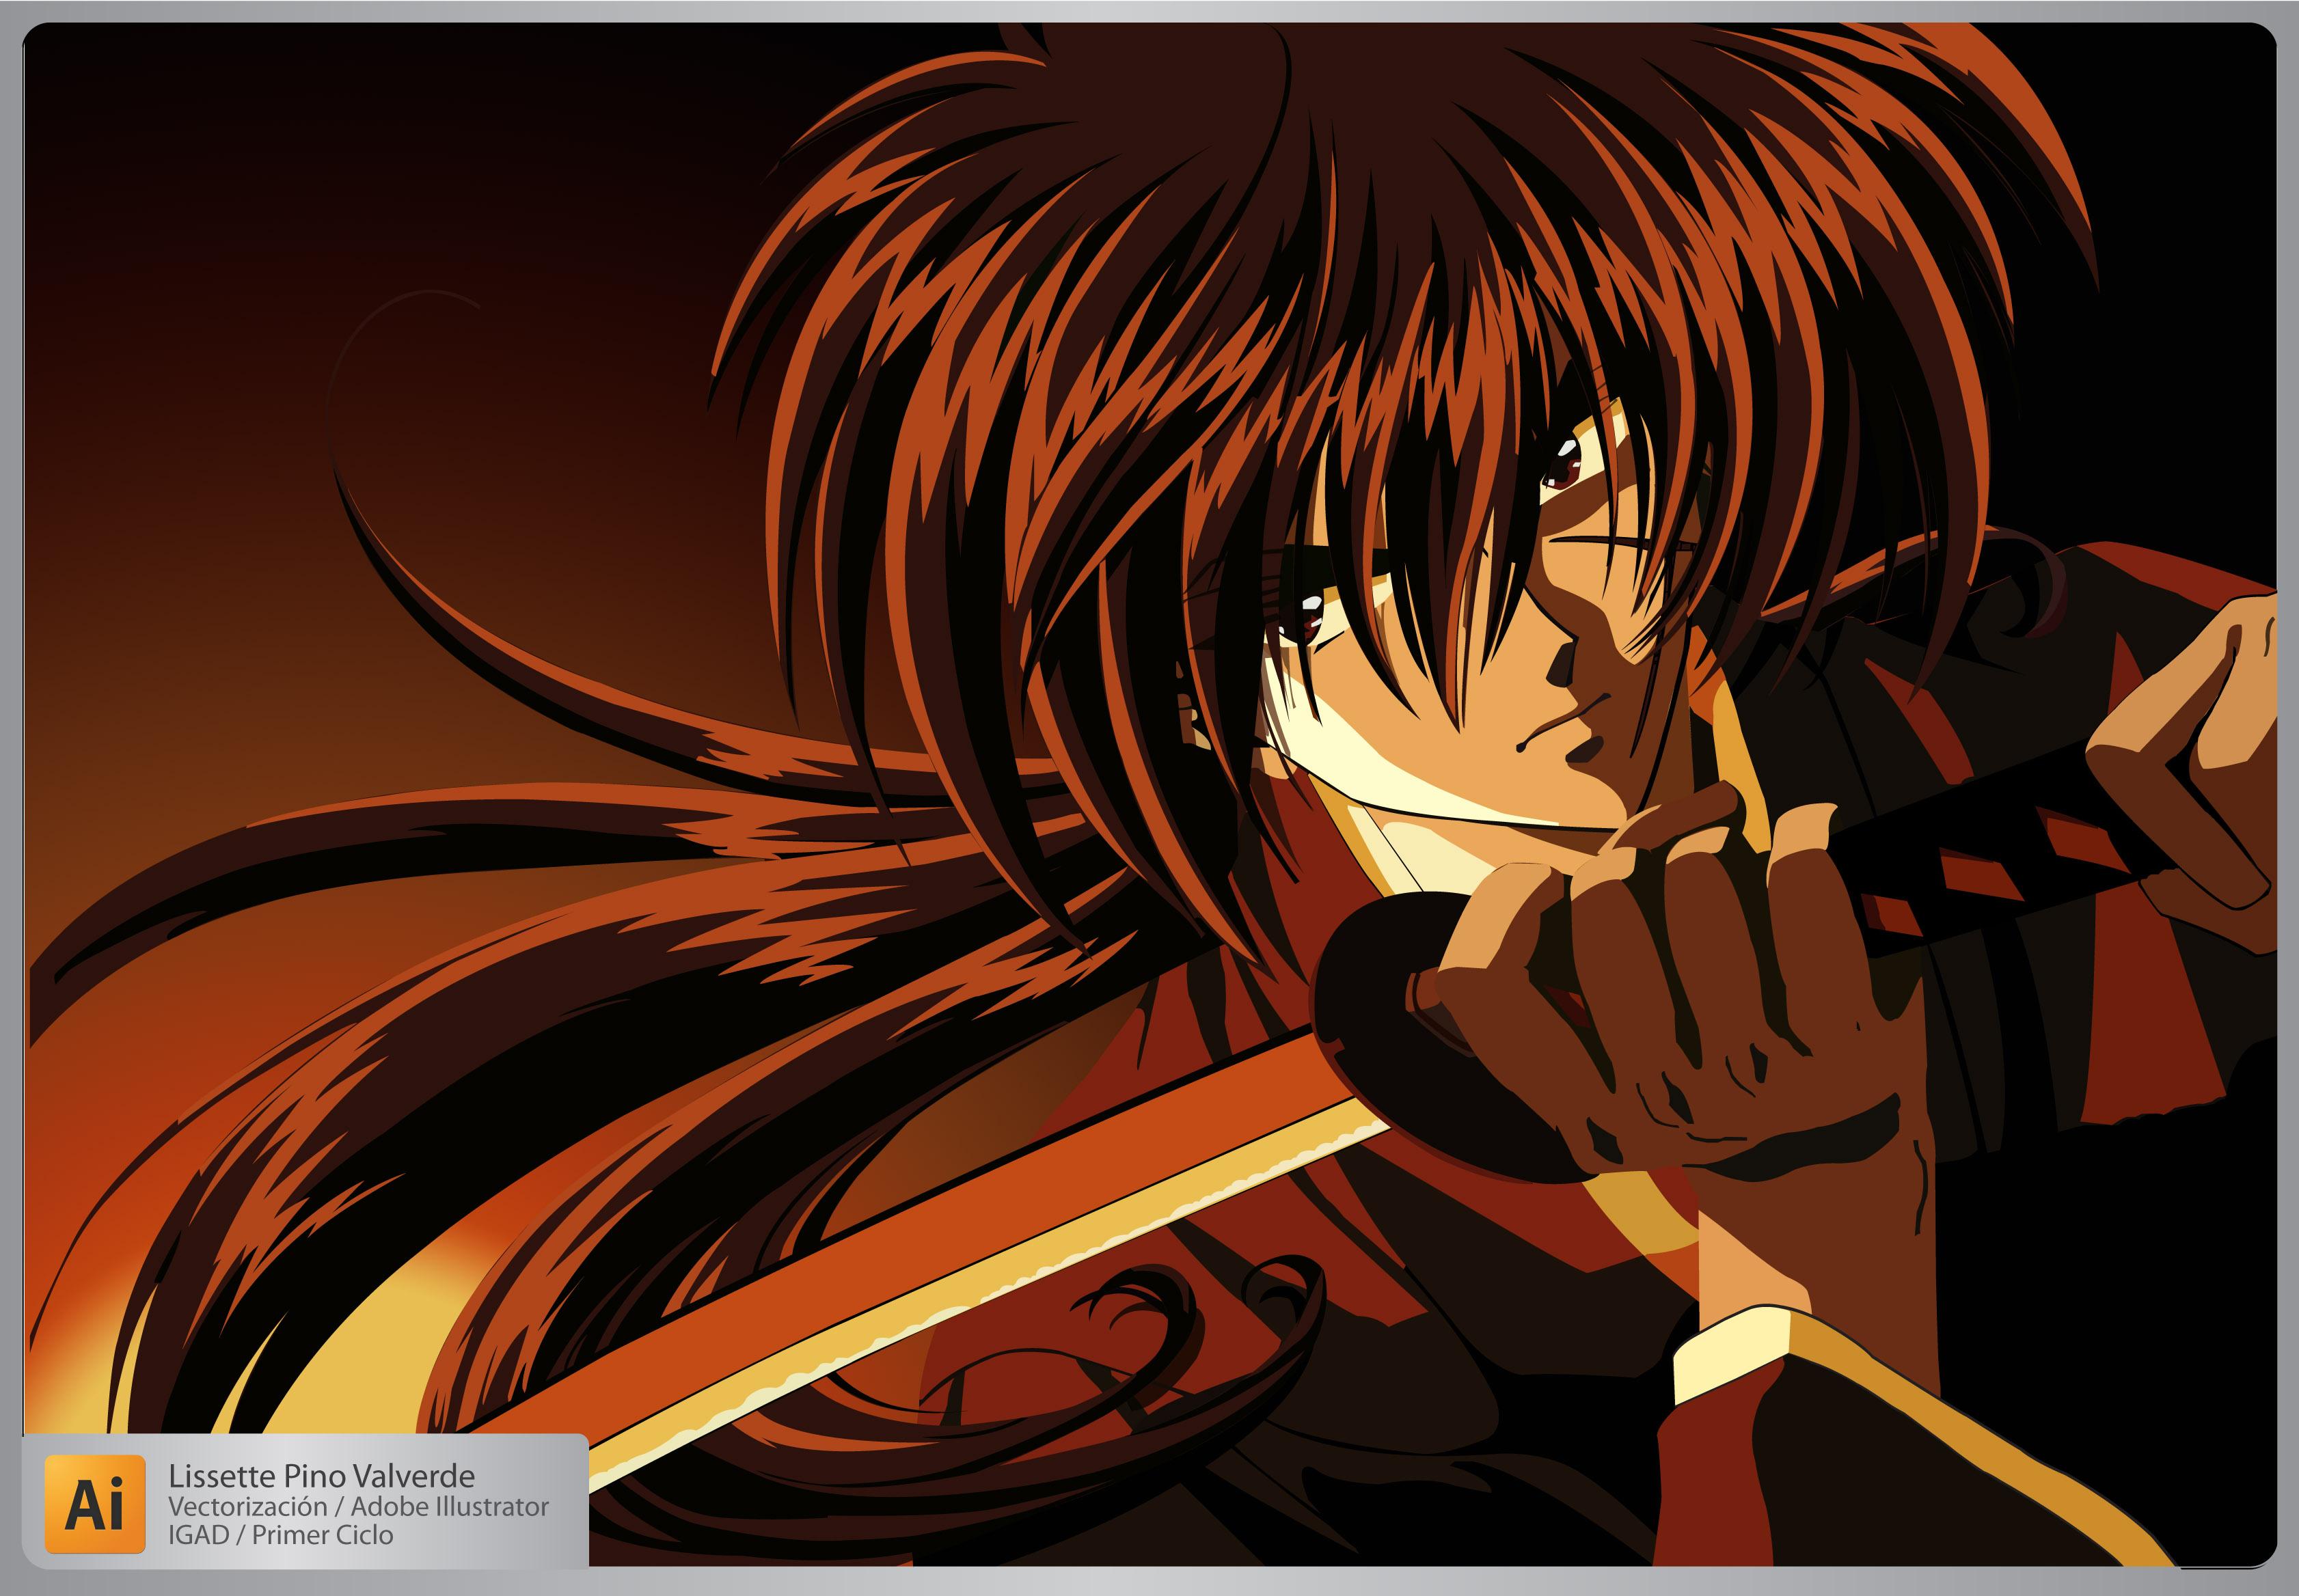 Samurai X by Yuriko200 on DeviantArt